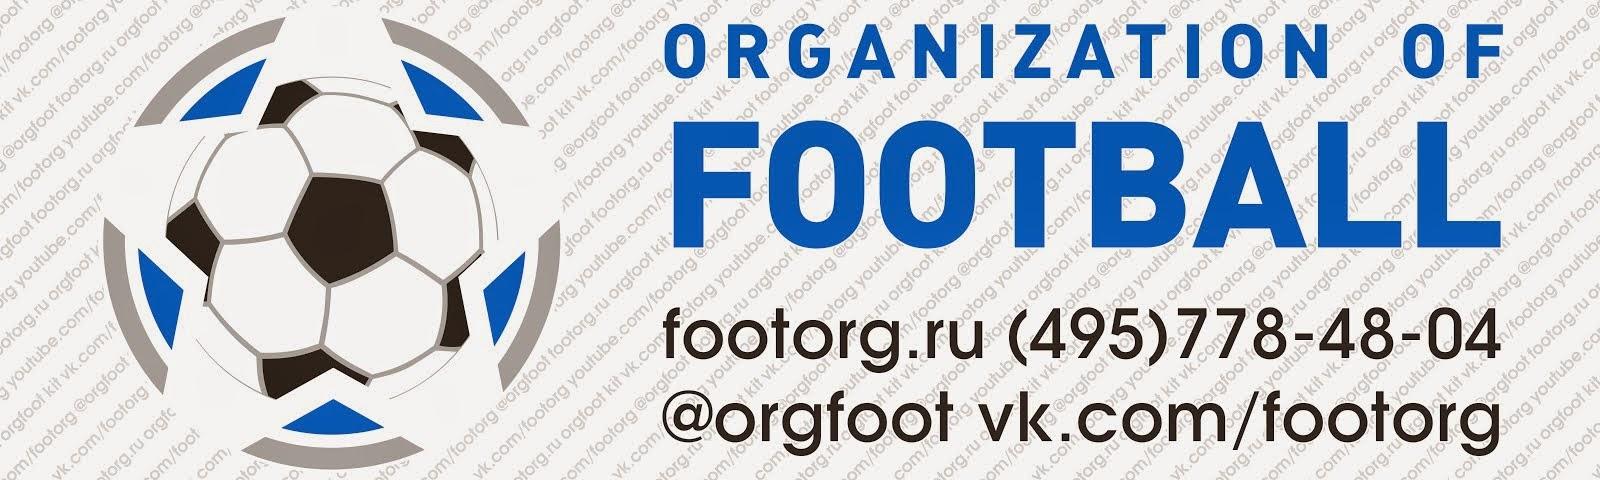 "Блог клуба ""Организация футбола"""